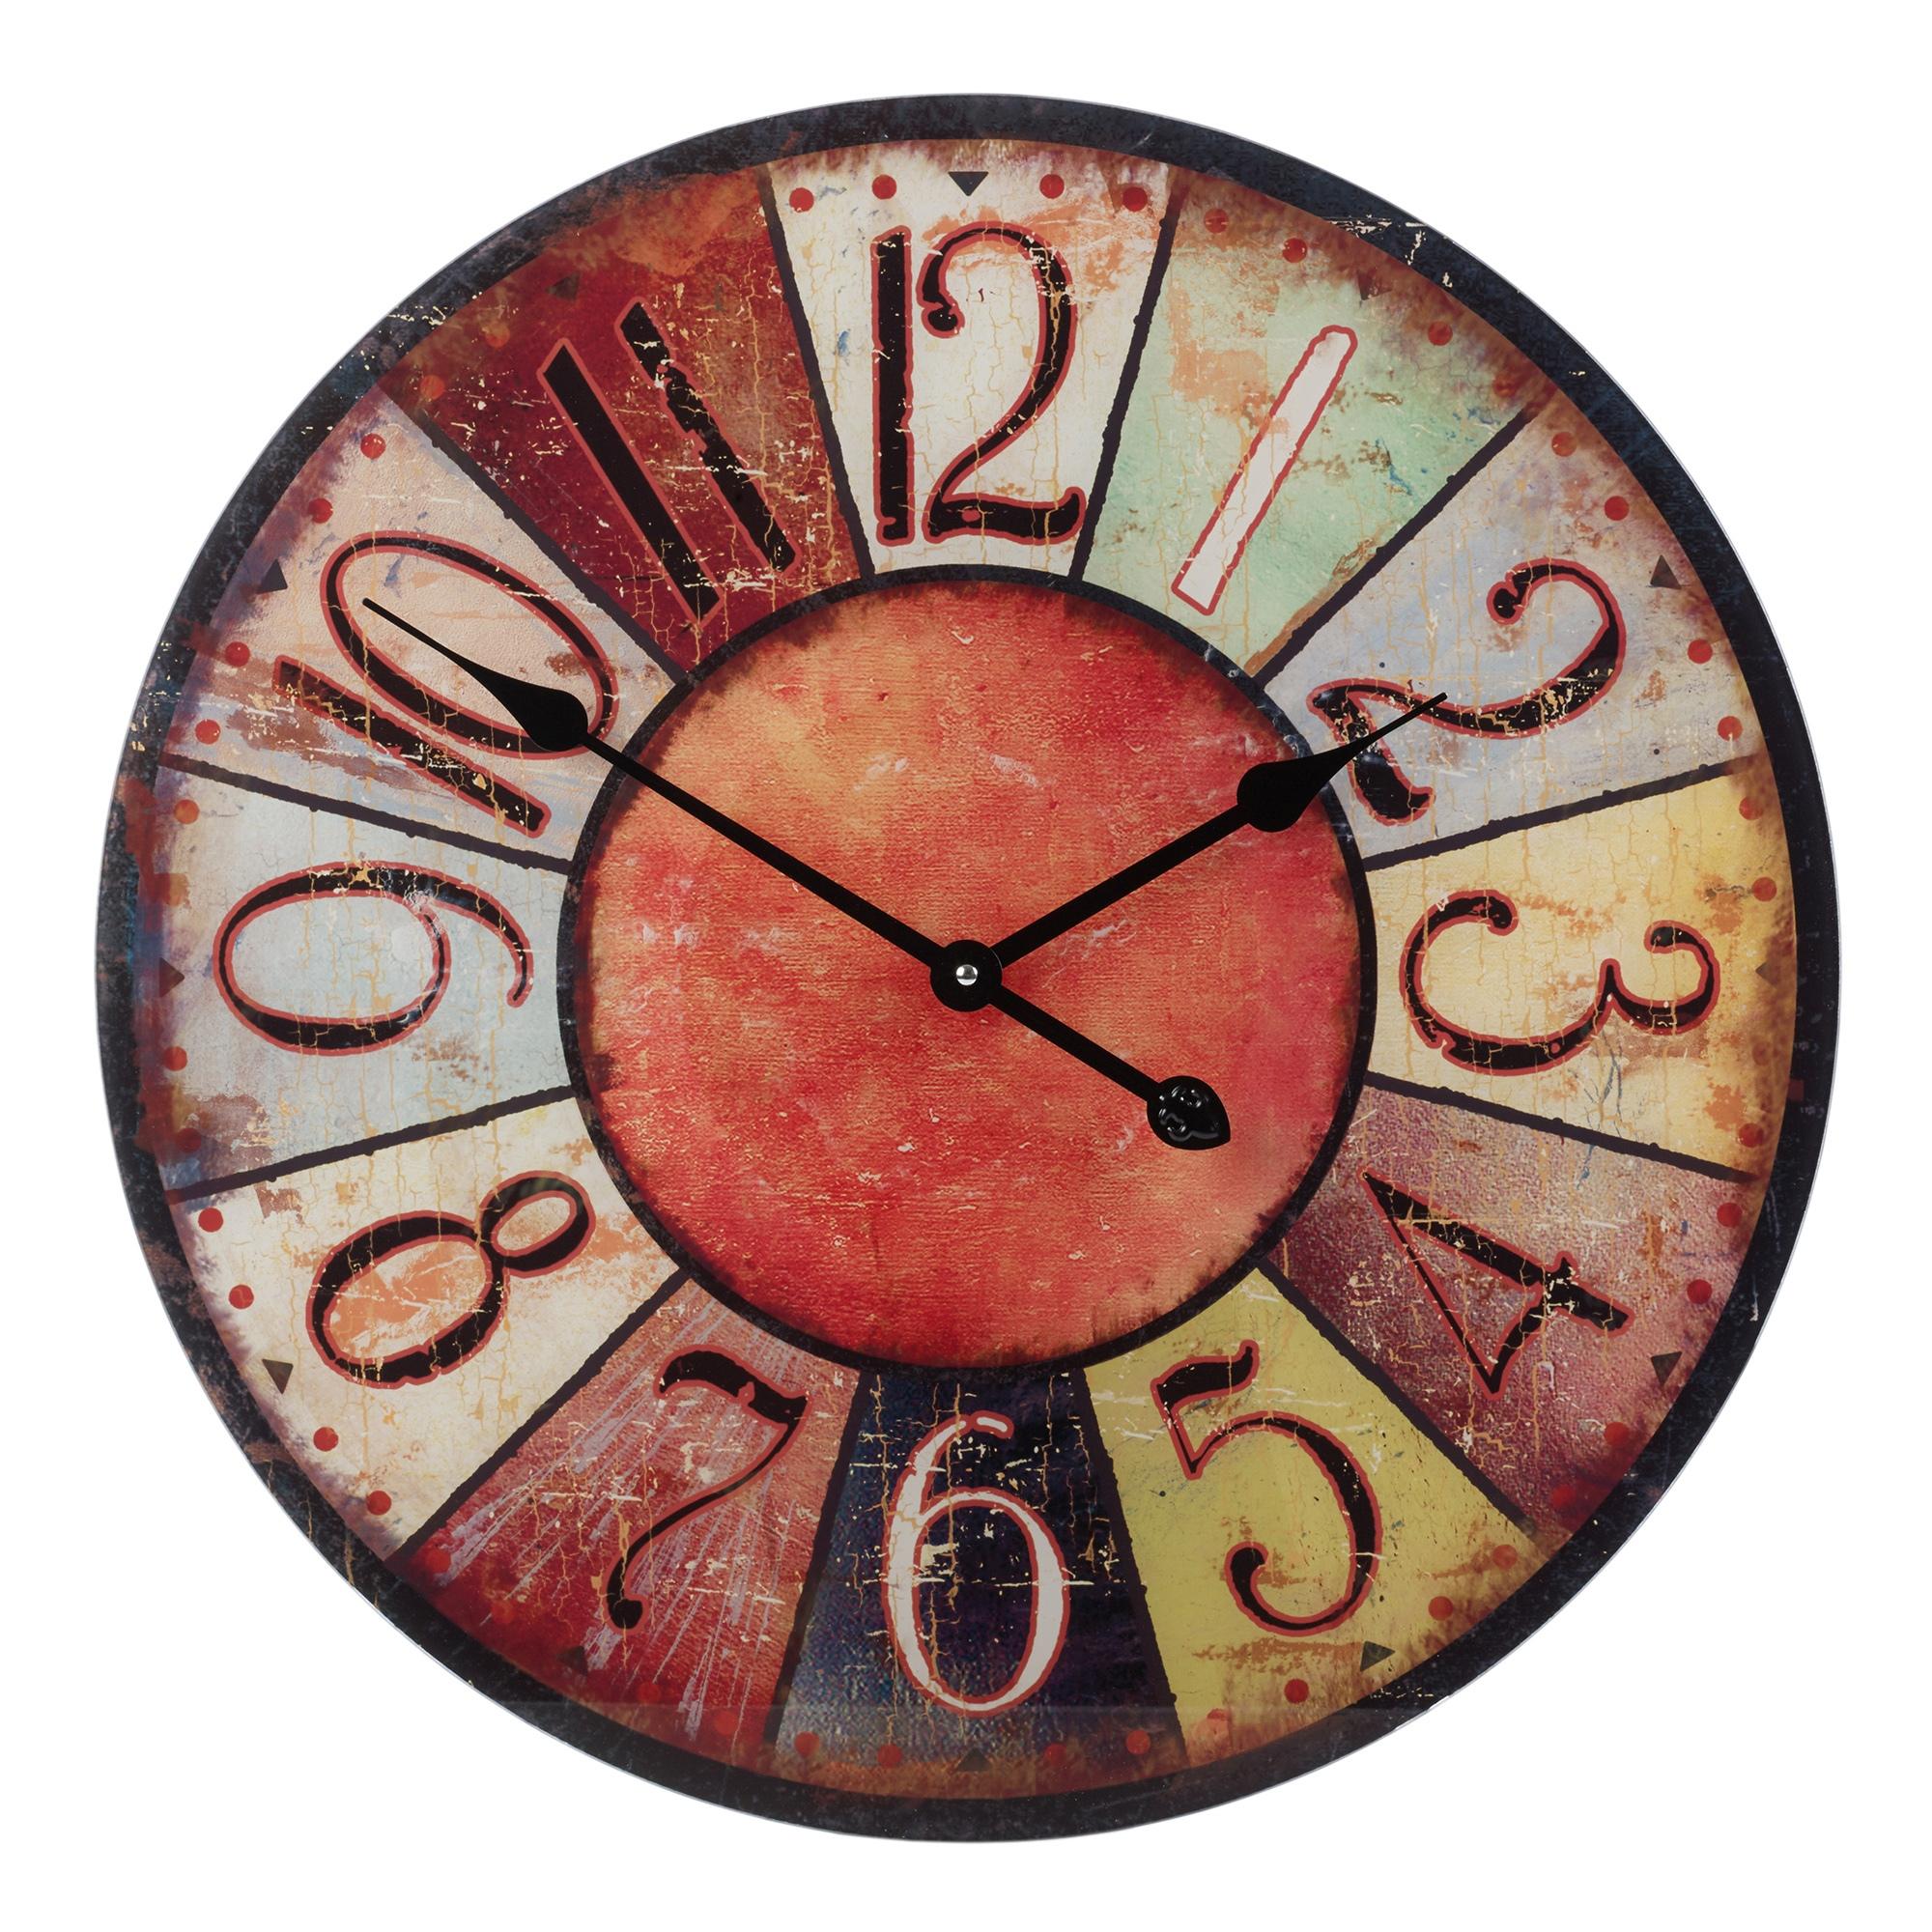 57cm Large Round Glass Shabby Wall Clock Vintage Retro ...